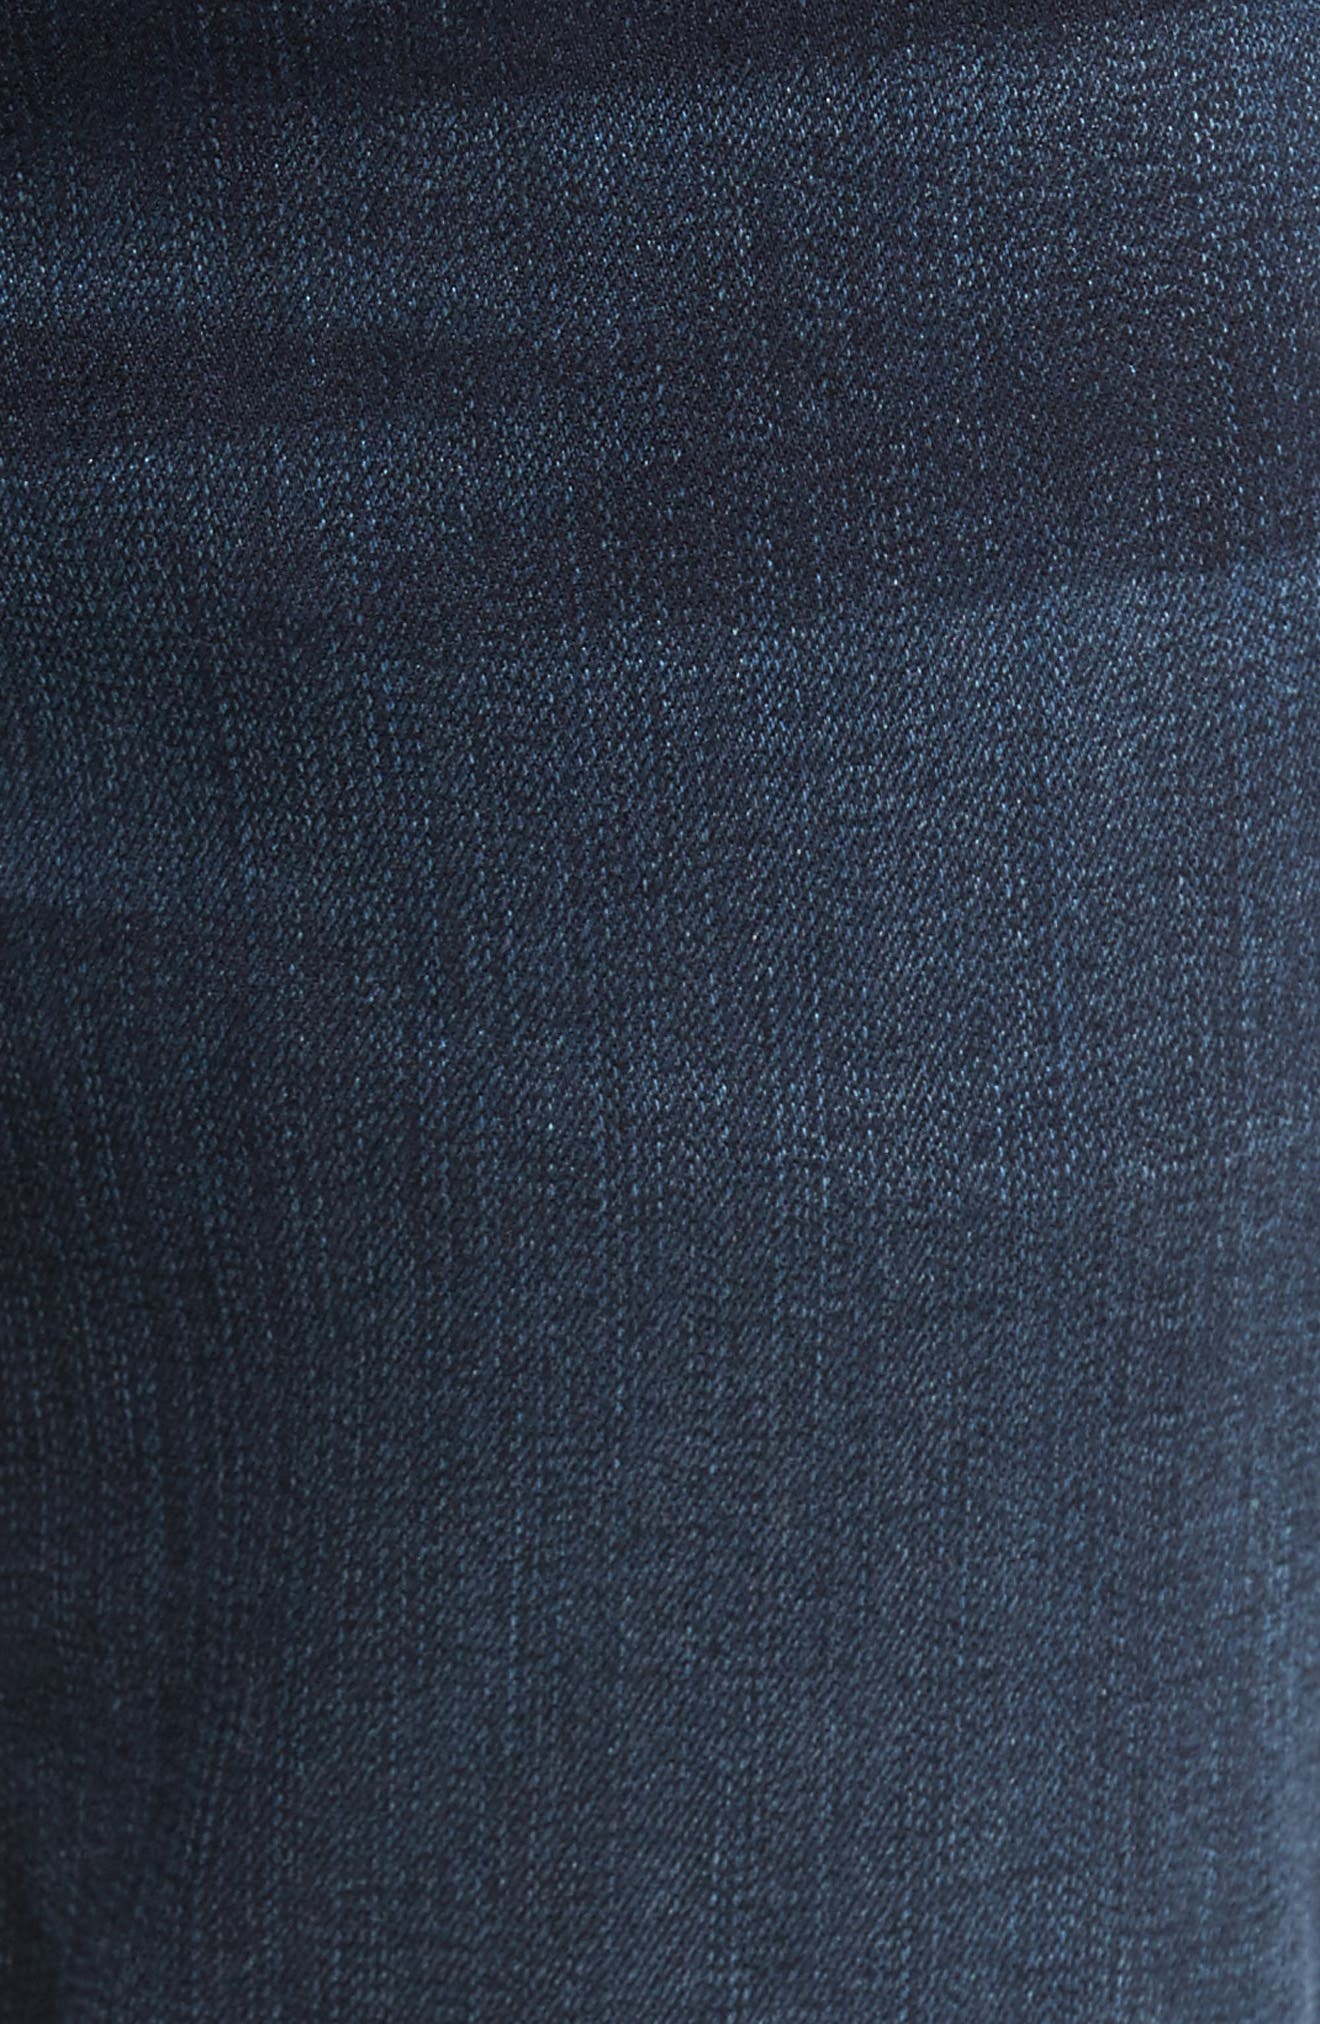 Blake Slim Fit Jeans,                             Alternate thumbnail 15, color,